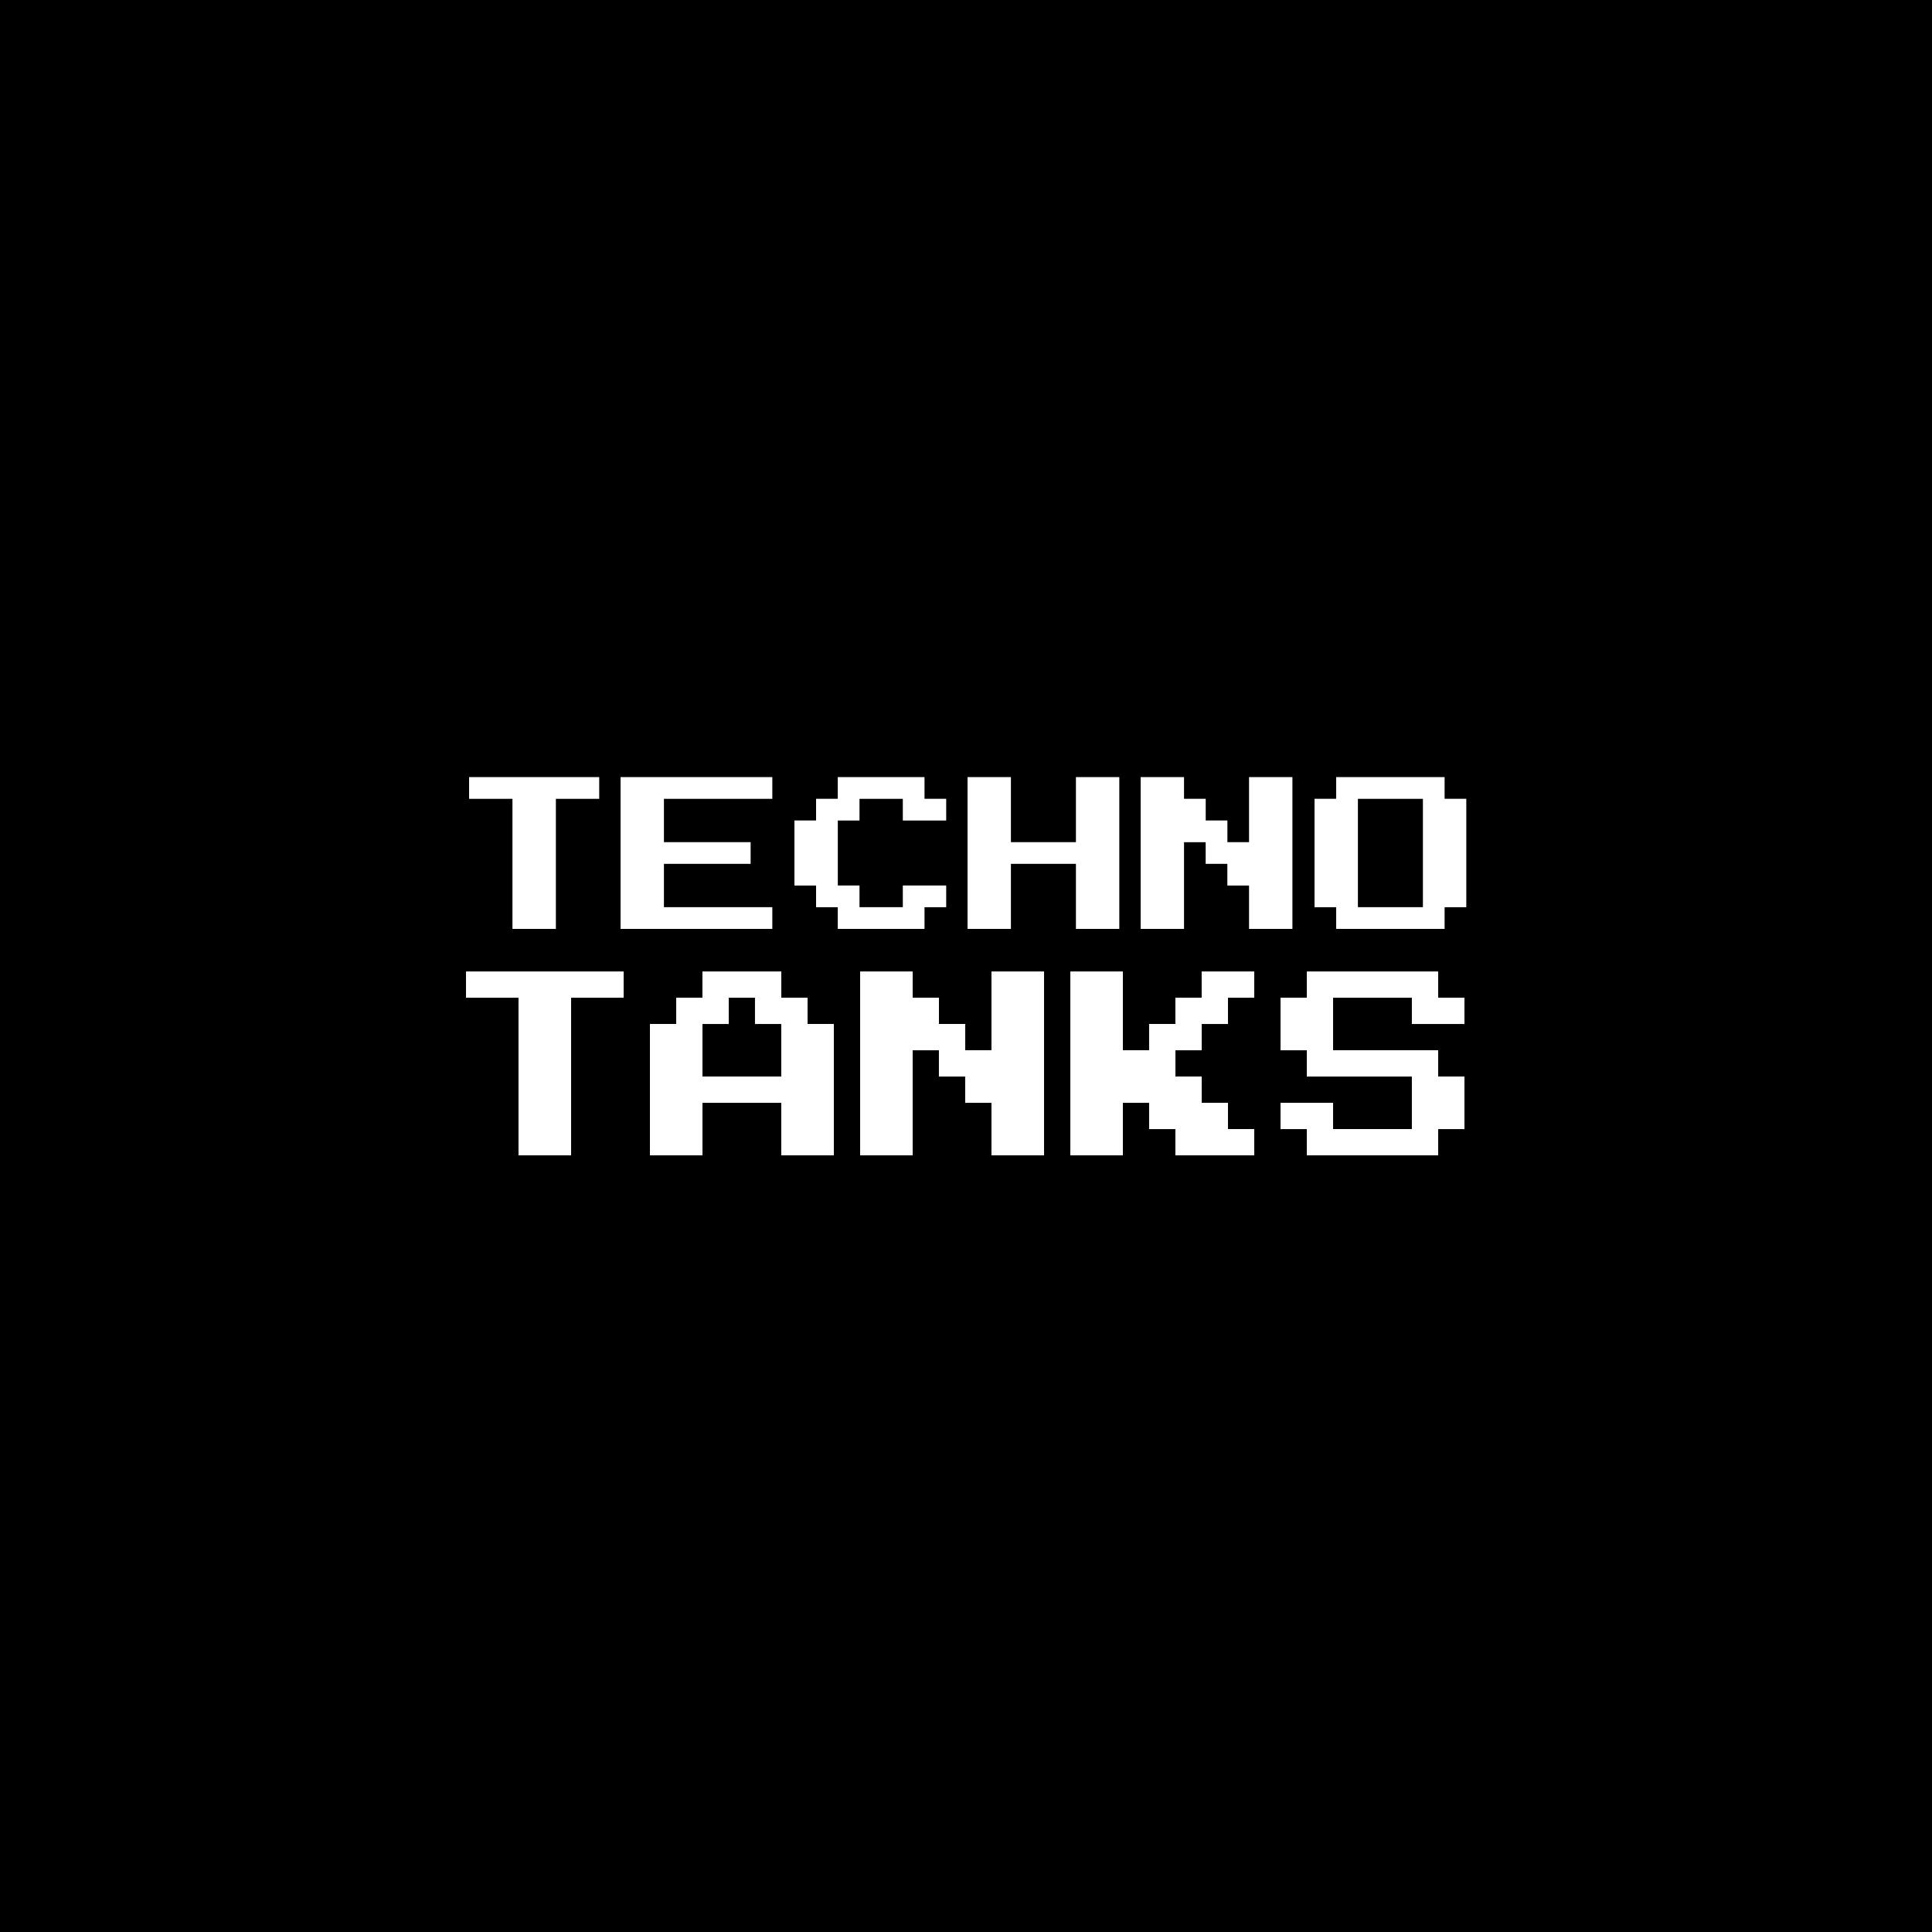 Techno Tanks logo